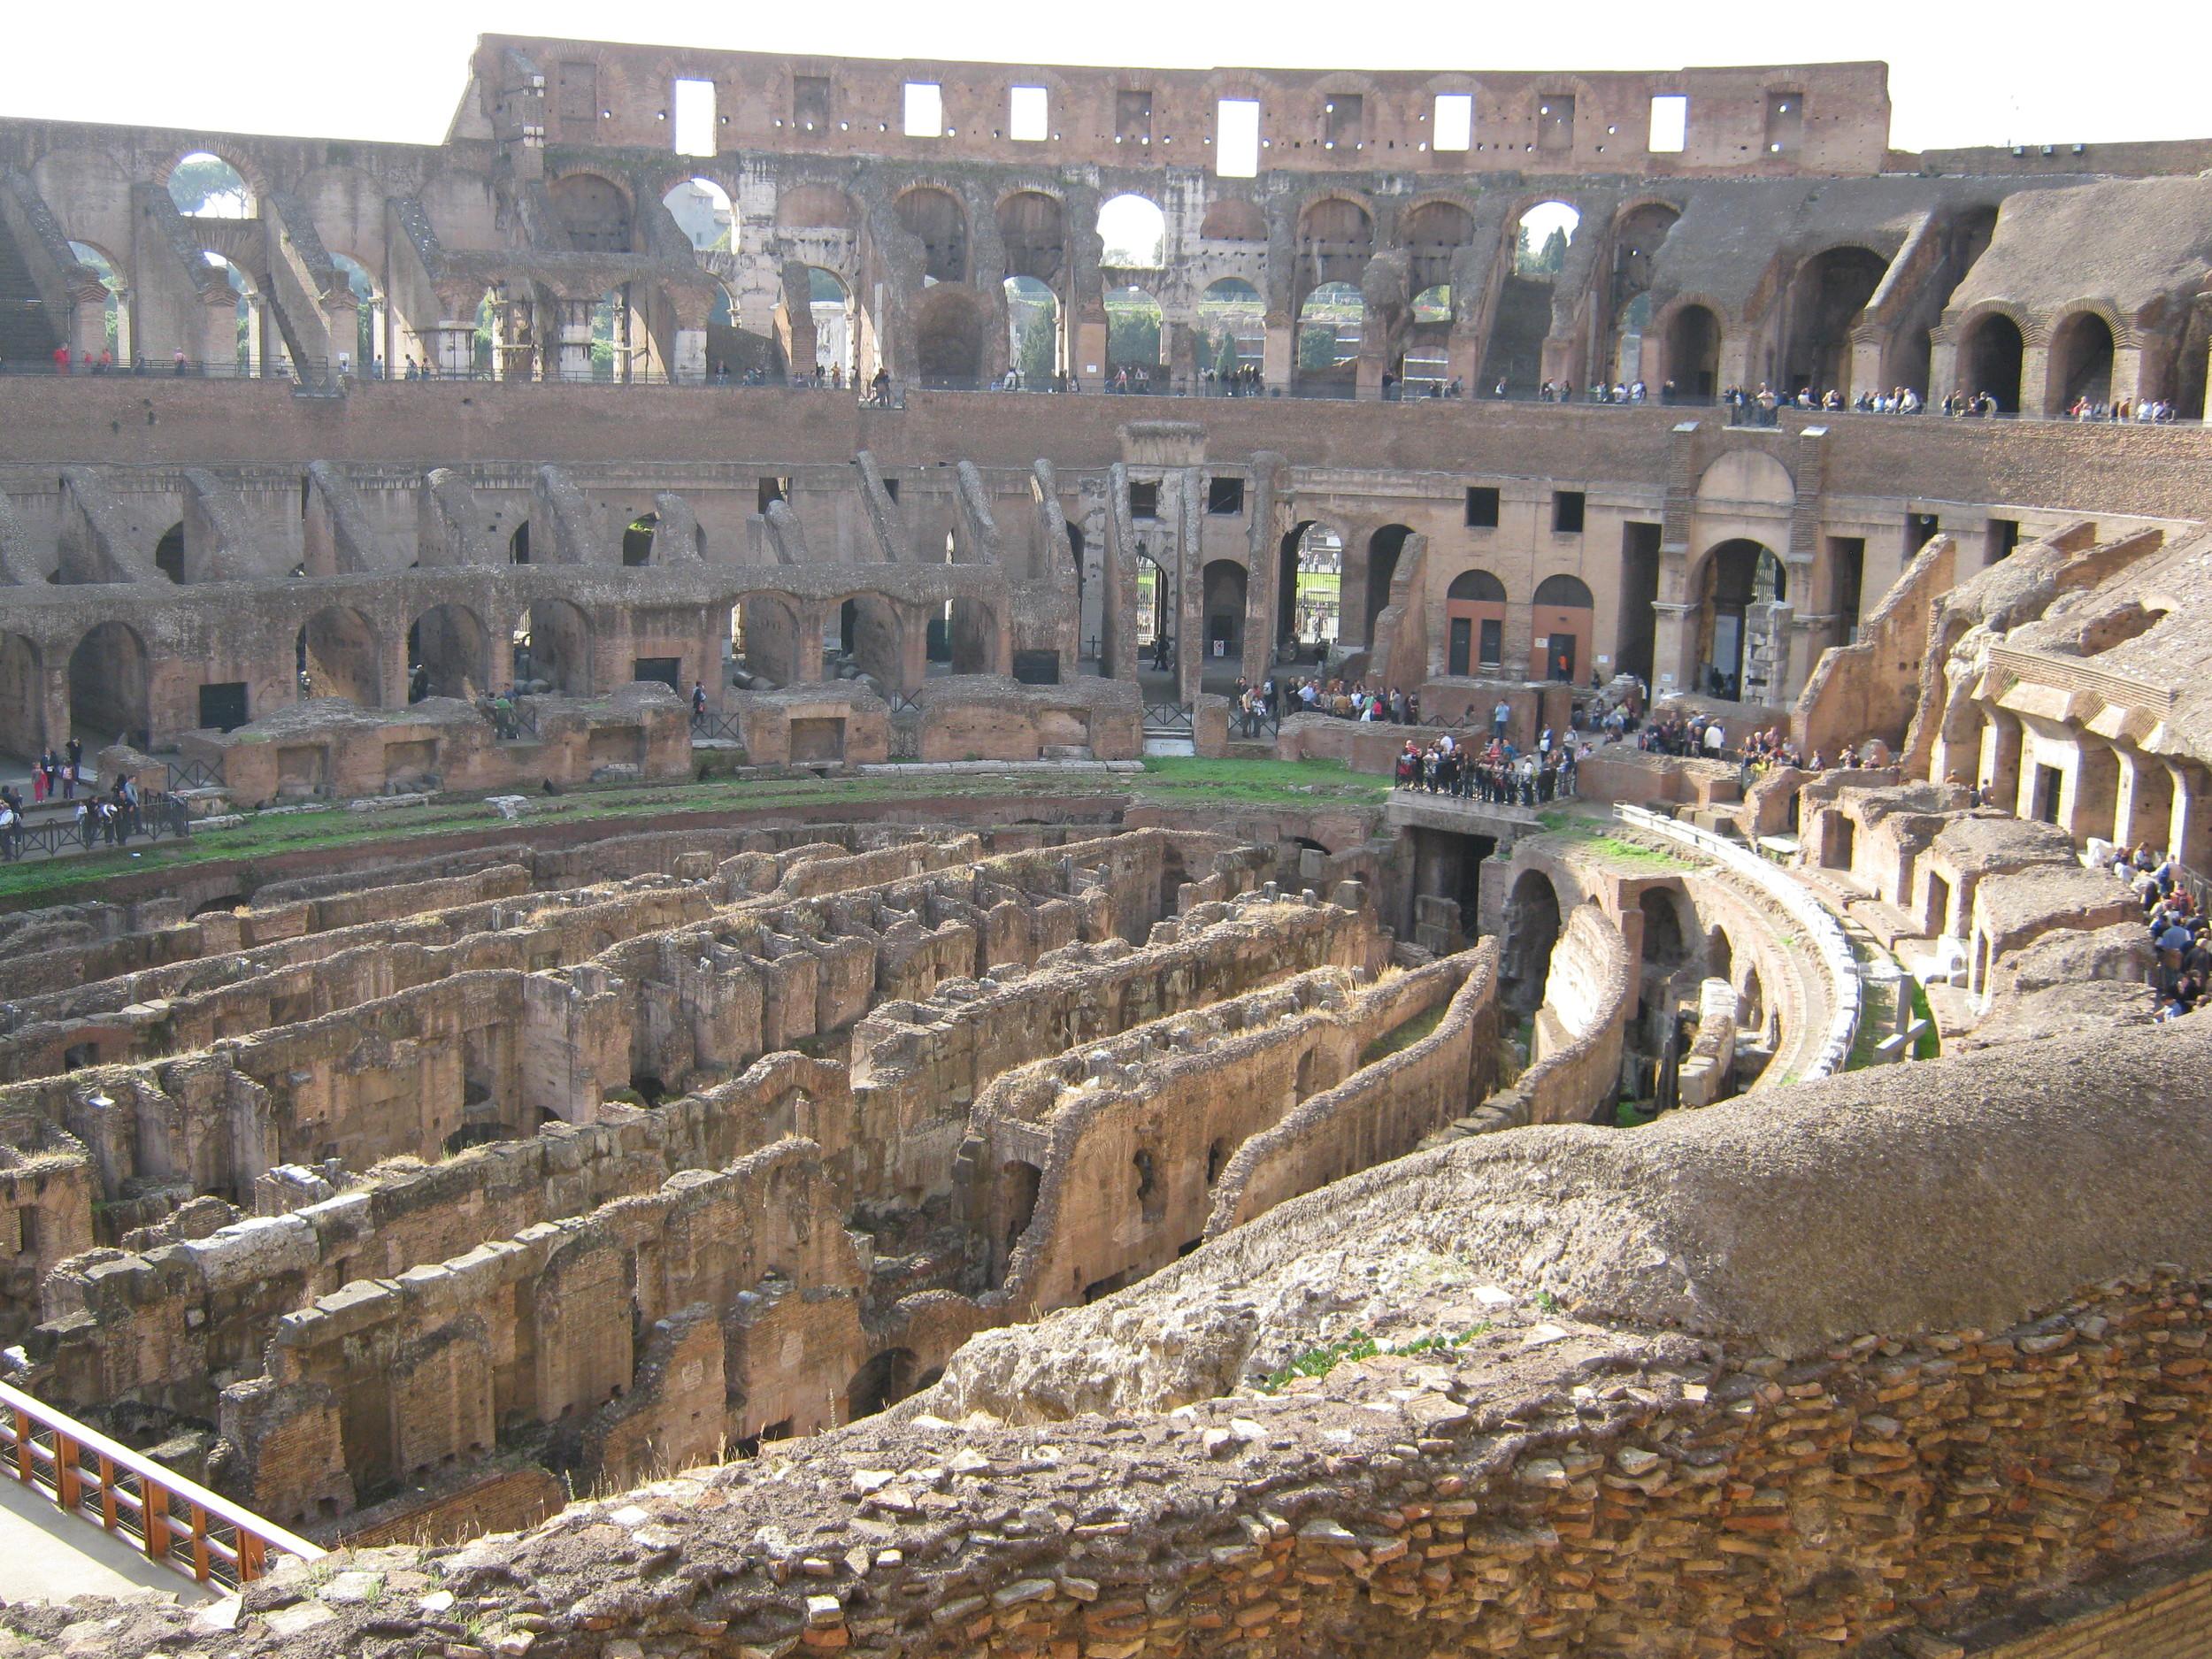 CRO Italy web 2009 - 69.JPG